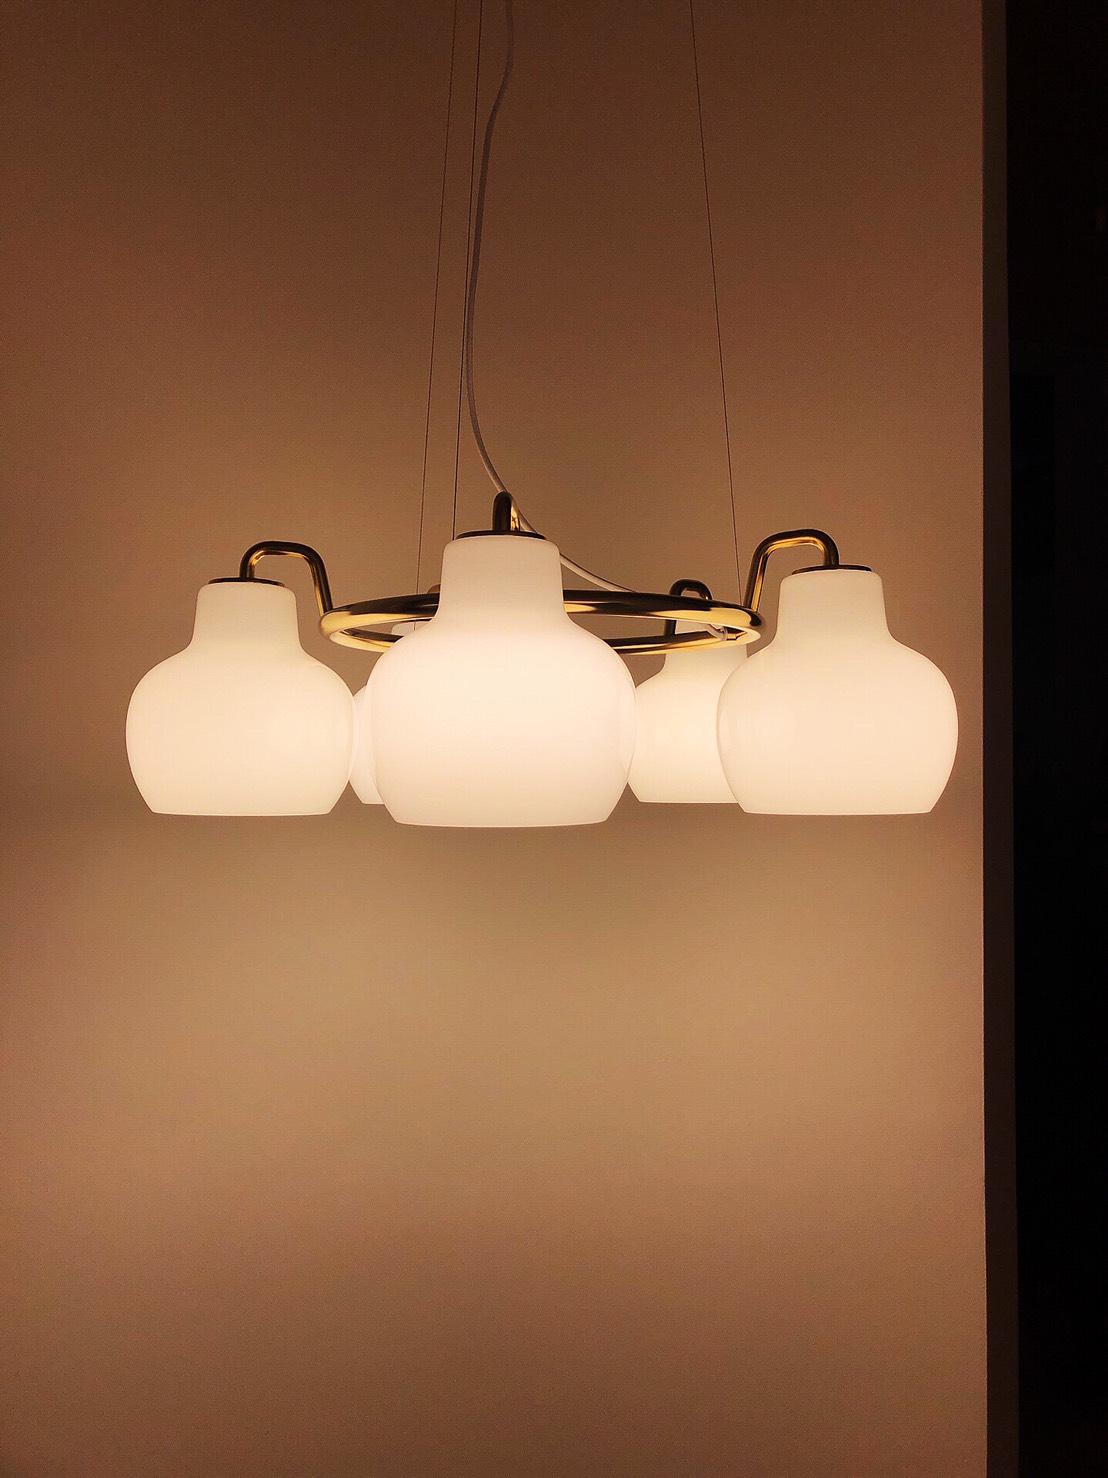 VL Ring Crown 吊燈 / 壁燈 - 以設計師 Vilhelm Lauritzen 之名,蛋白石玻璃燈罩弧線串連出線性的柔美,線戒冠狀框架點綴奢華黃銅,仿若聖潔的鈴蘭。未經氧化處理的黃銅材質會隨著時間出現令人驚喜的變化。